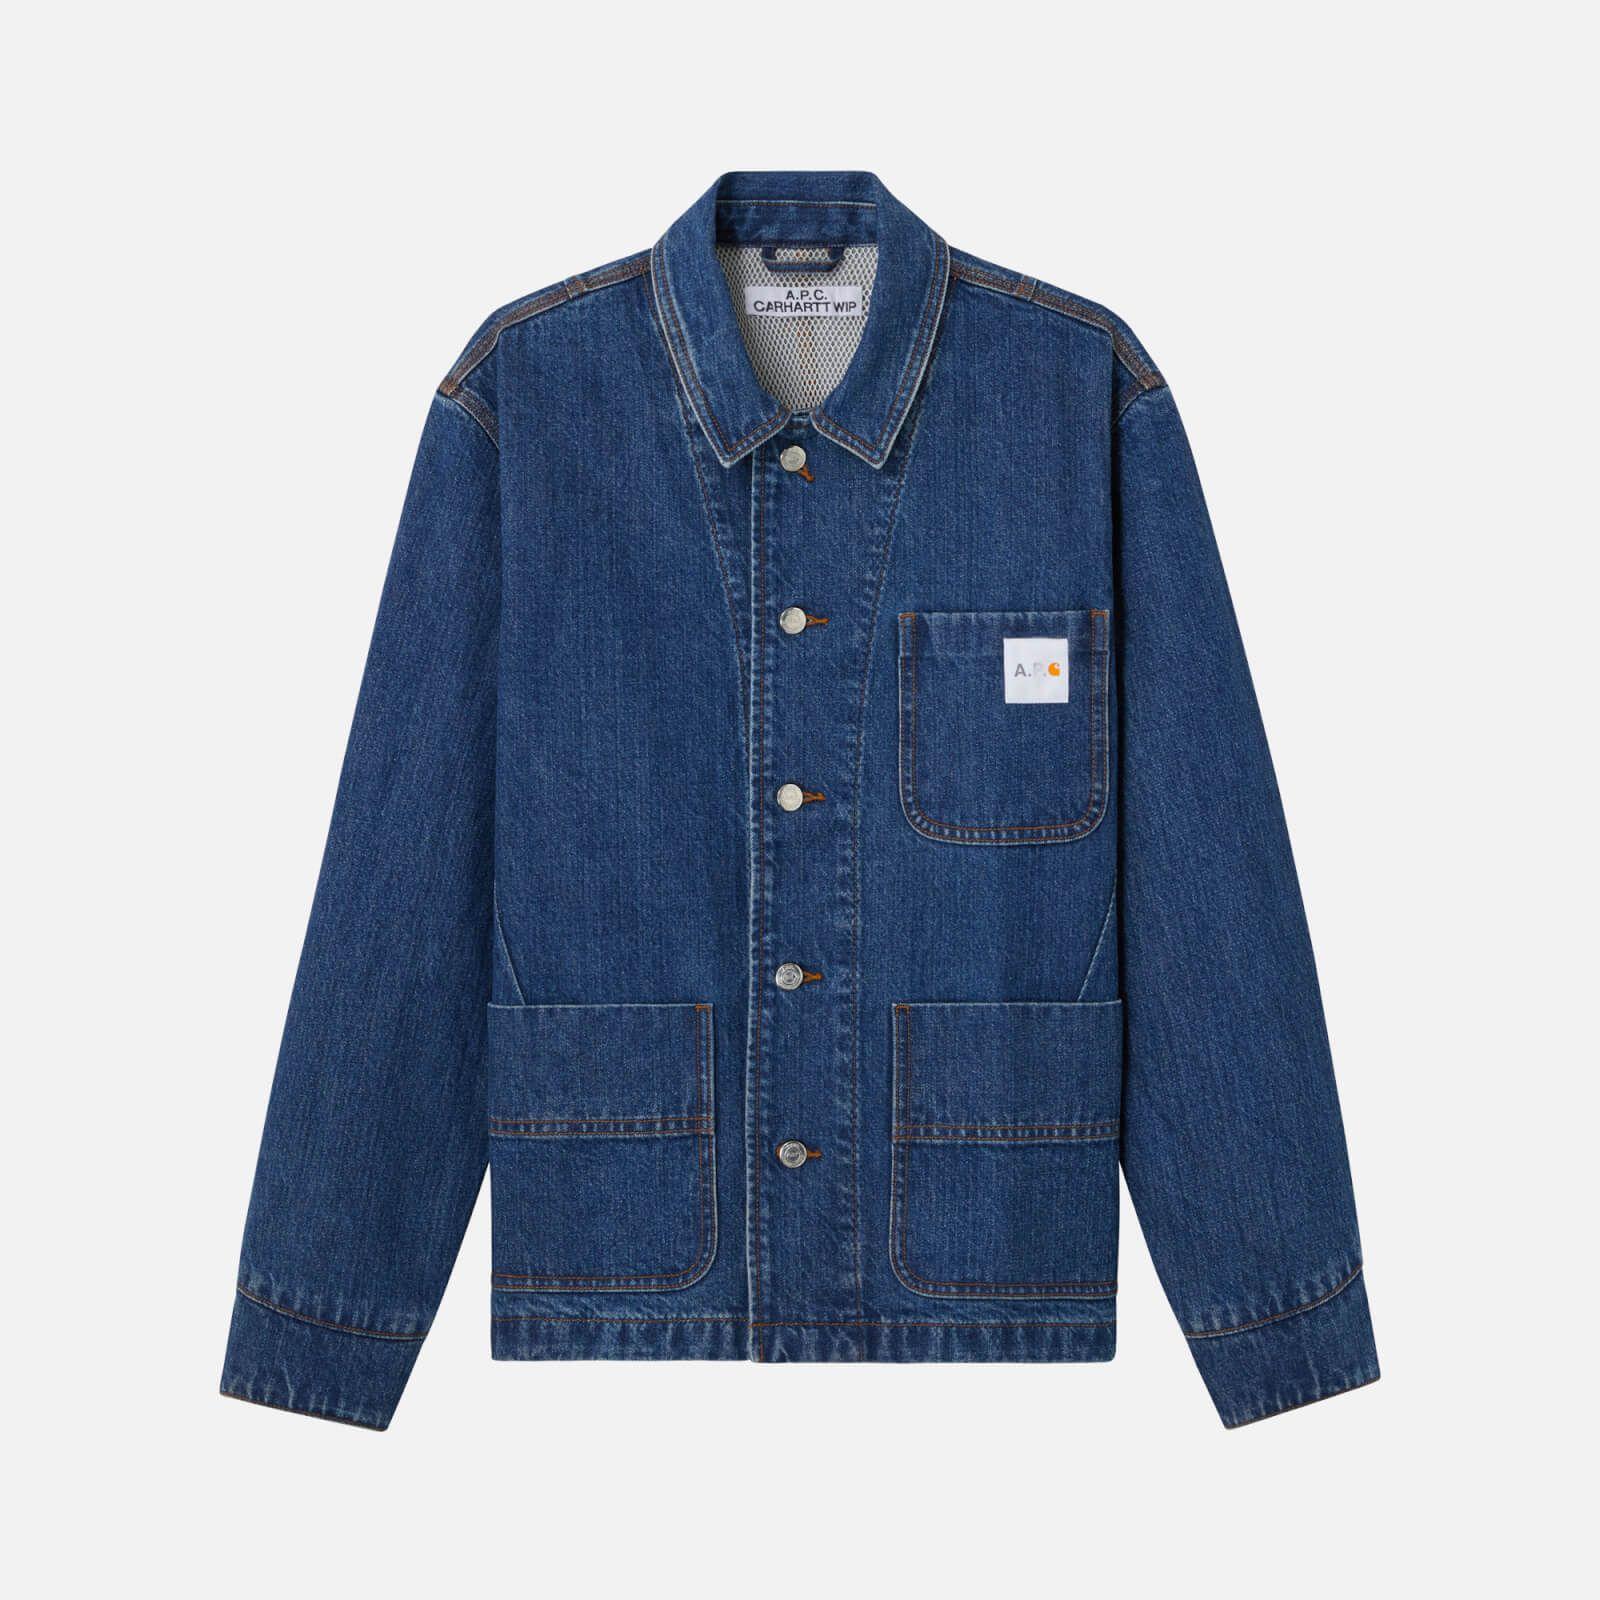 A P C X Carhartt Men S Overshirt Indigo Delave Affiliate Ad Men Carhartt Delave Carhartt Denim Jacket White Shirt Men Leather Bomber Jacket [ 1600 x 1600 Pixel ]